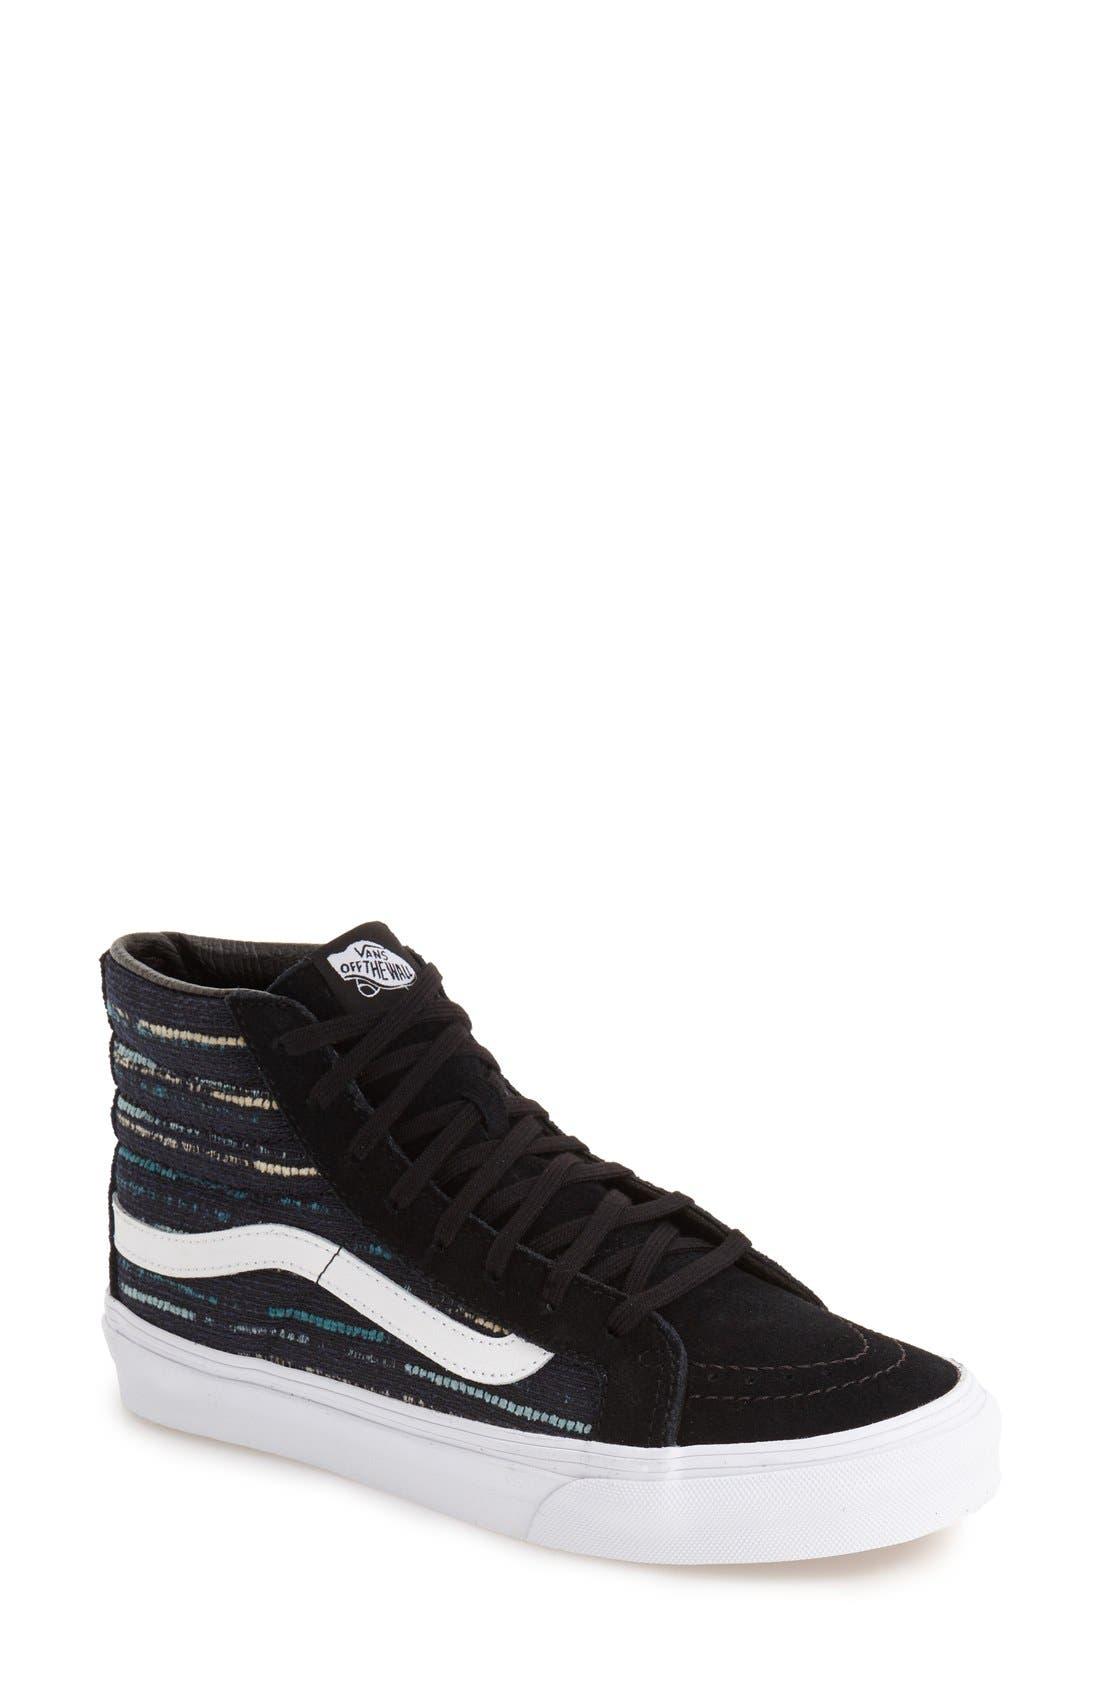 Alternate Image 1 Selected - Vans Sk-8 Hi Slim Sneaker (Women)